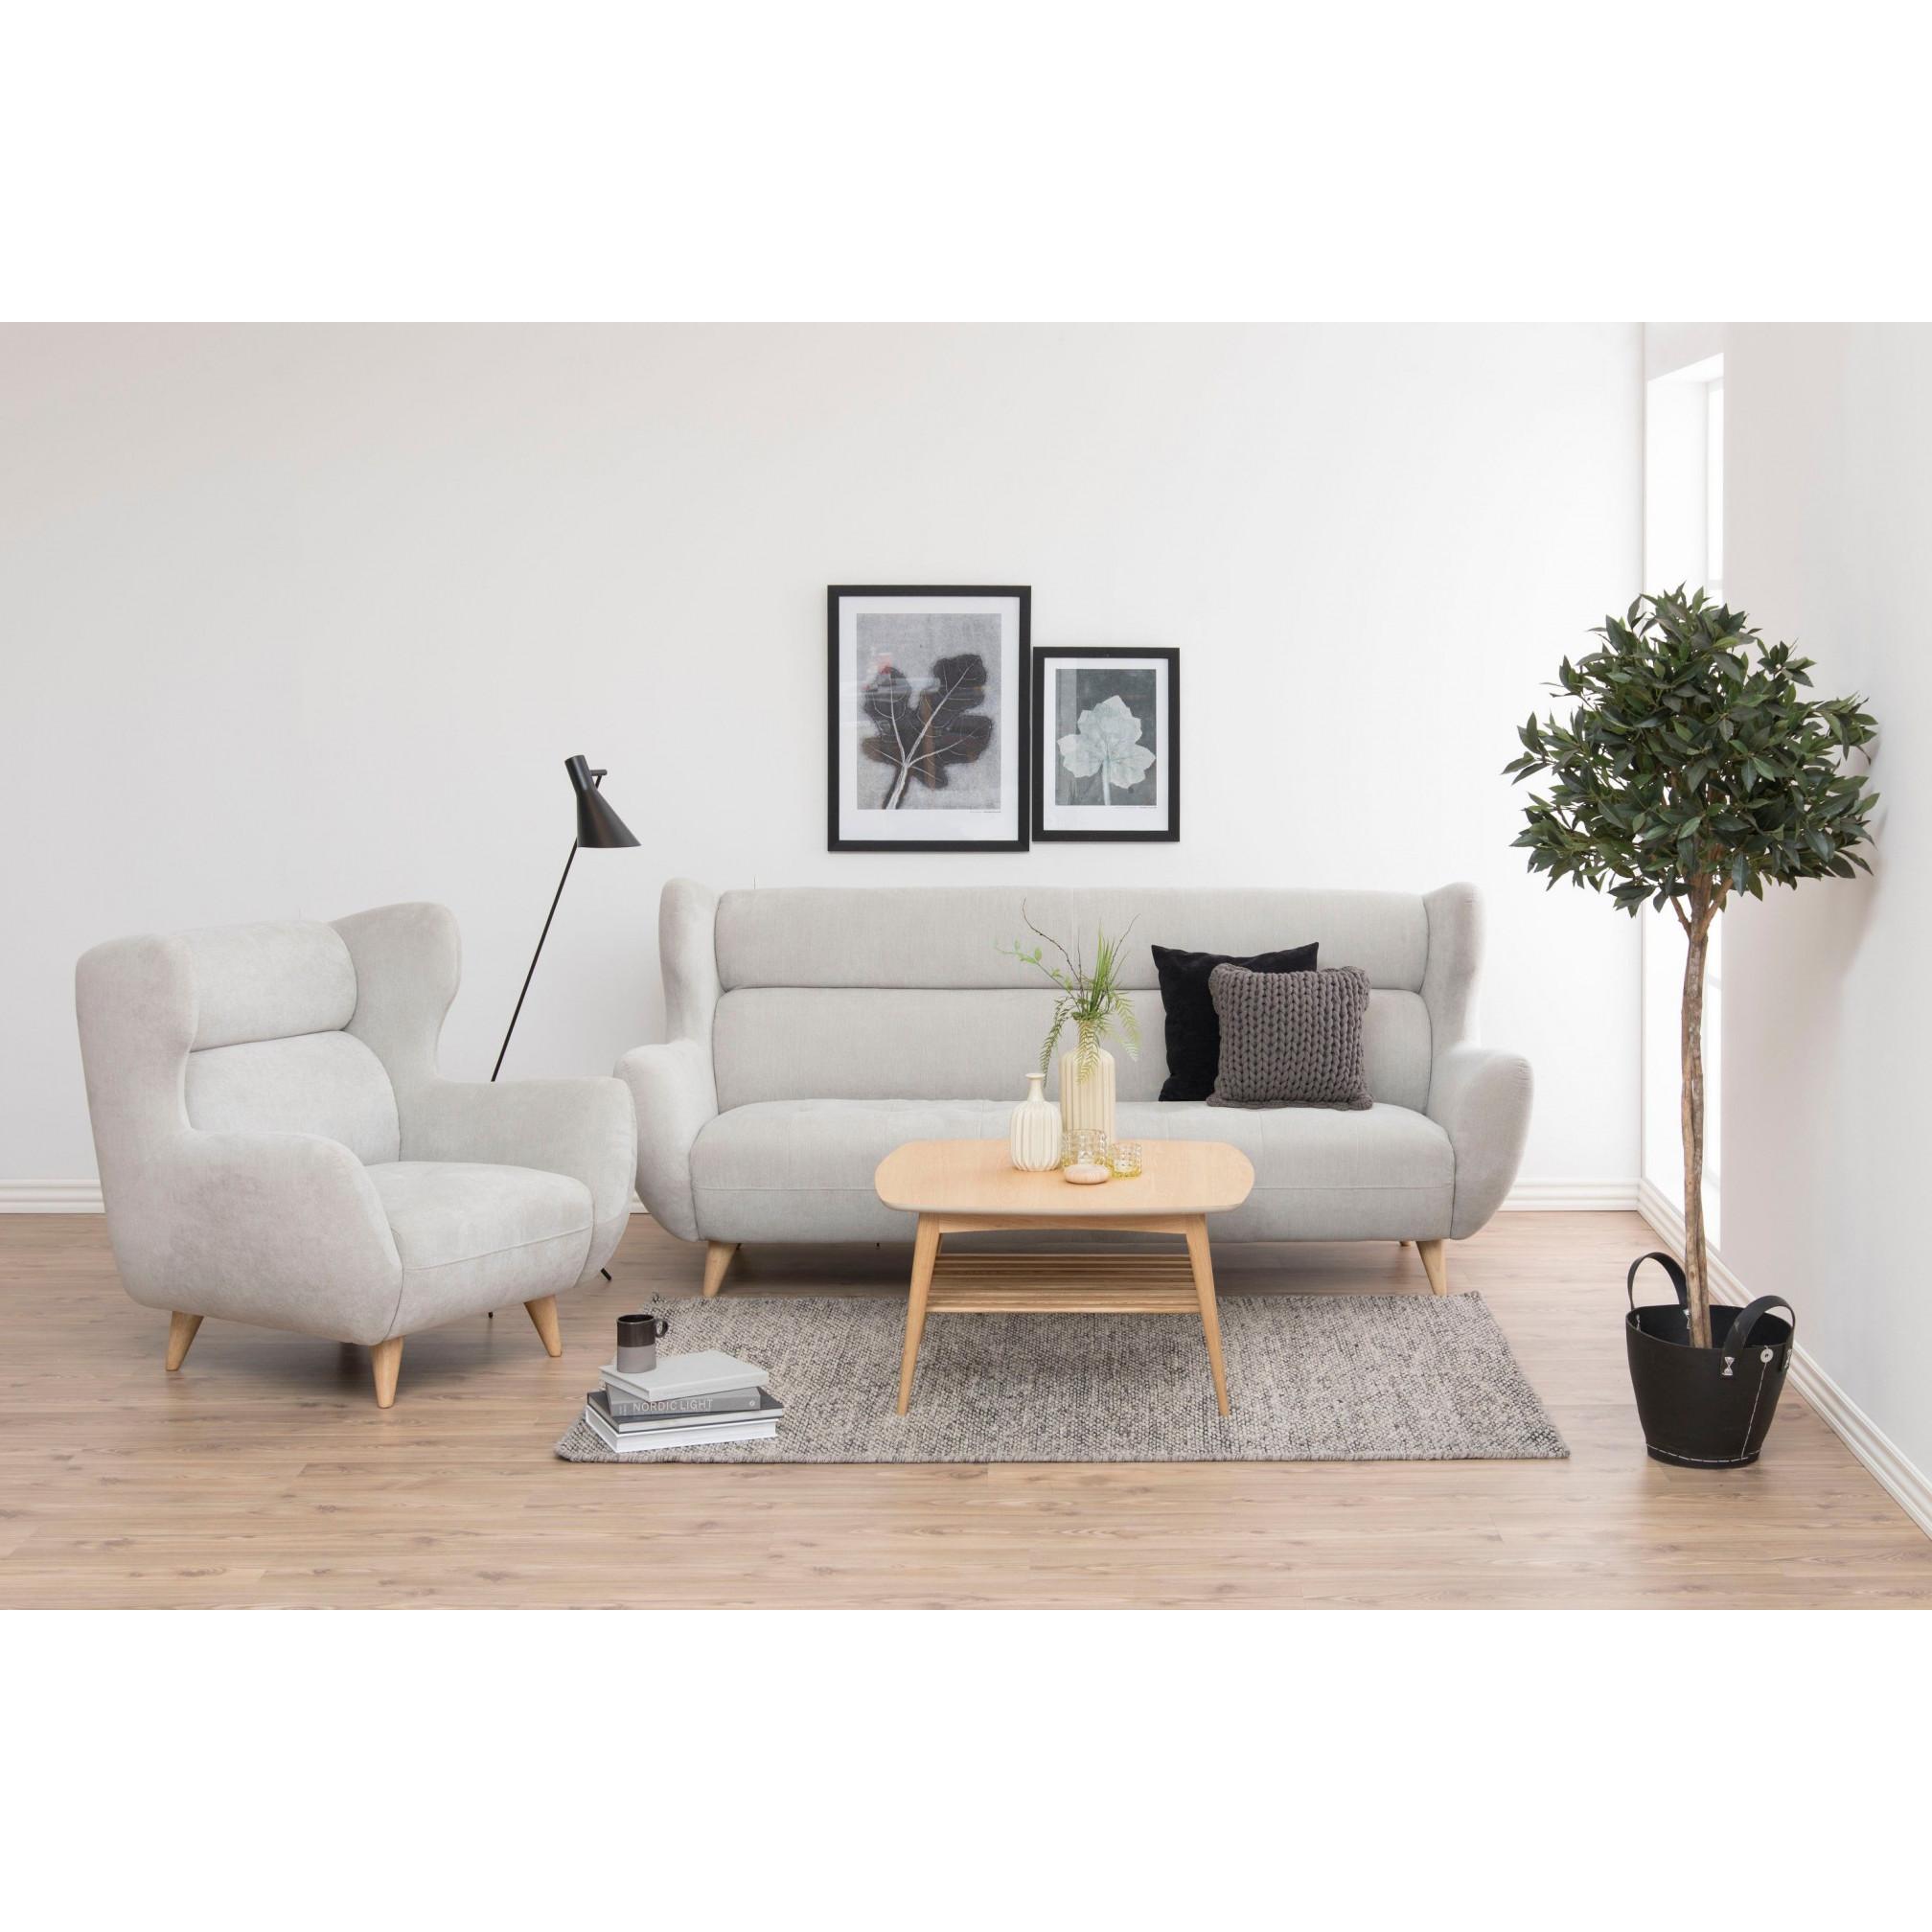 Olli Coffee Table | White Oak